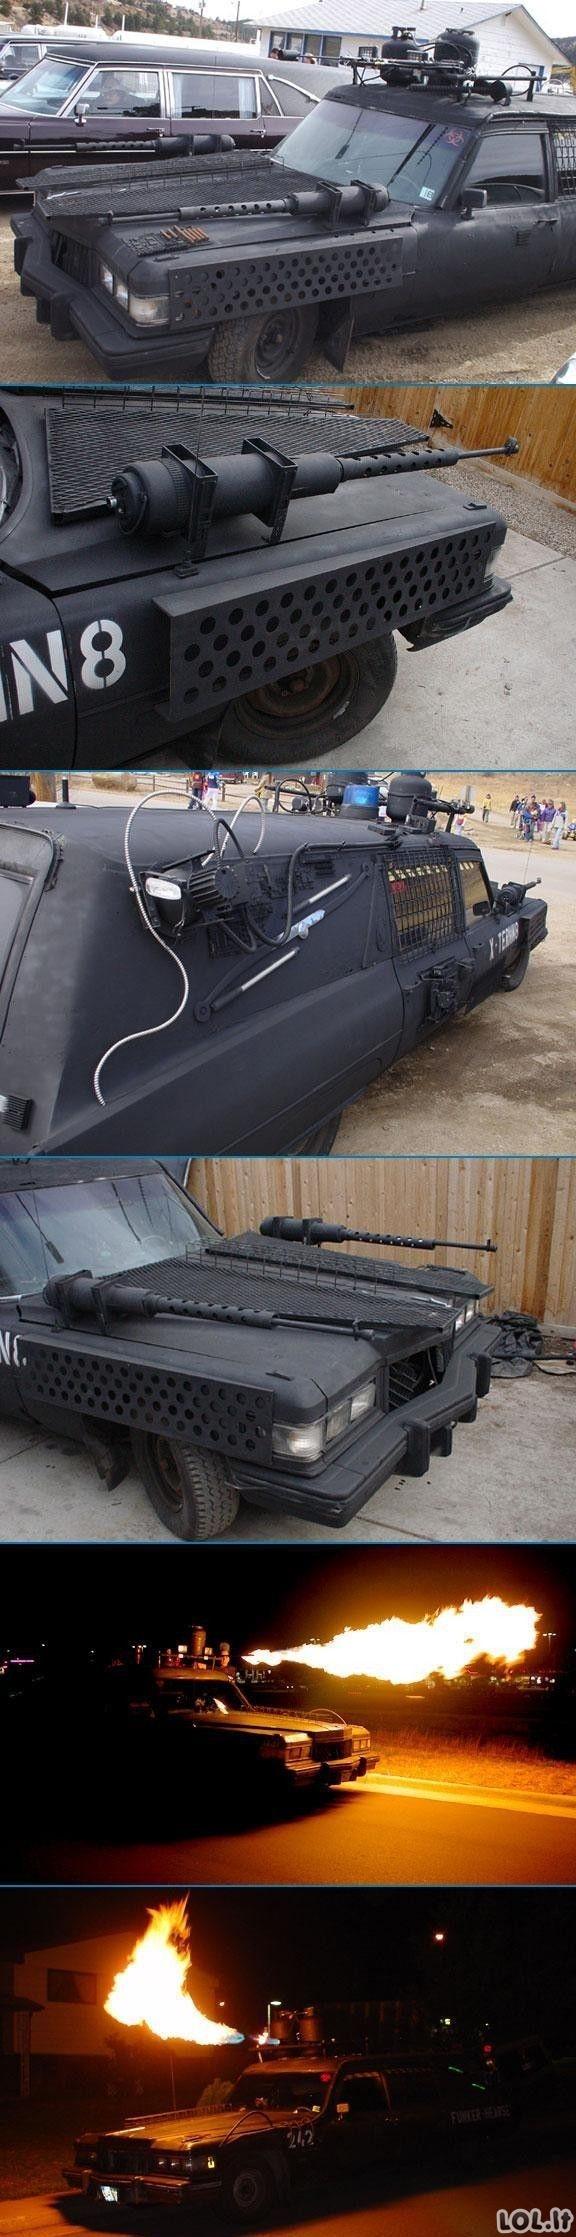 Chucko Norriso mašina